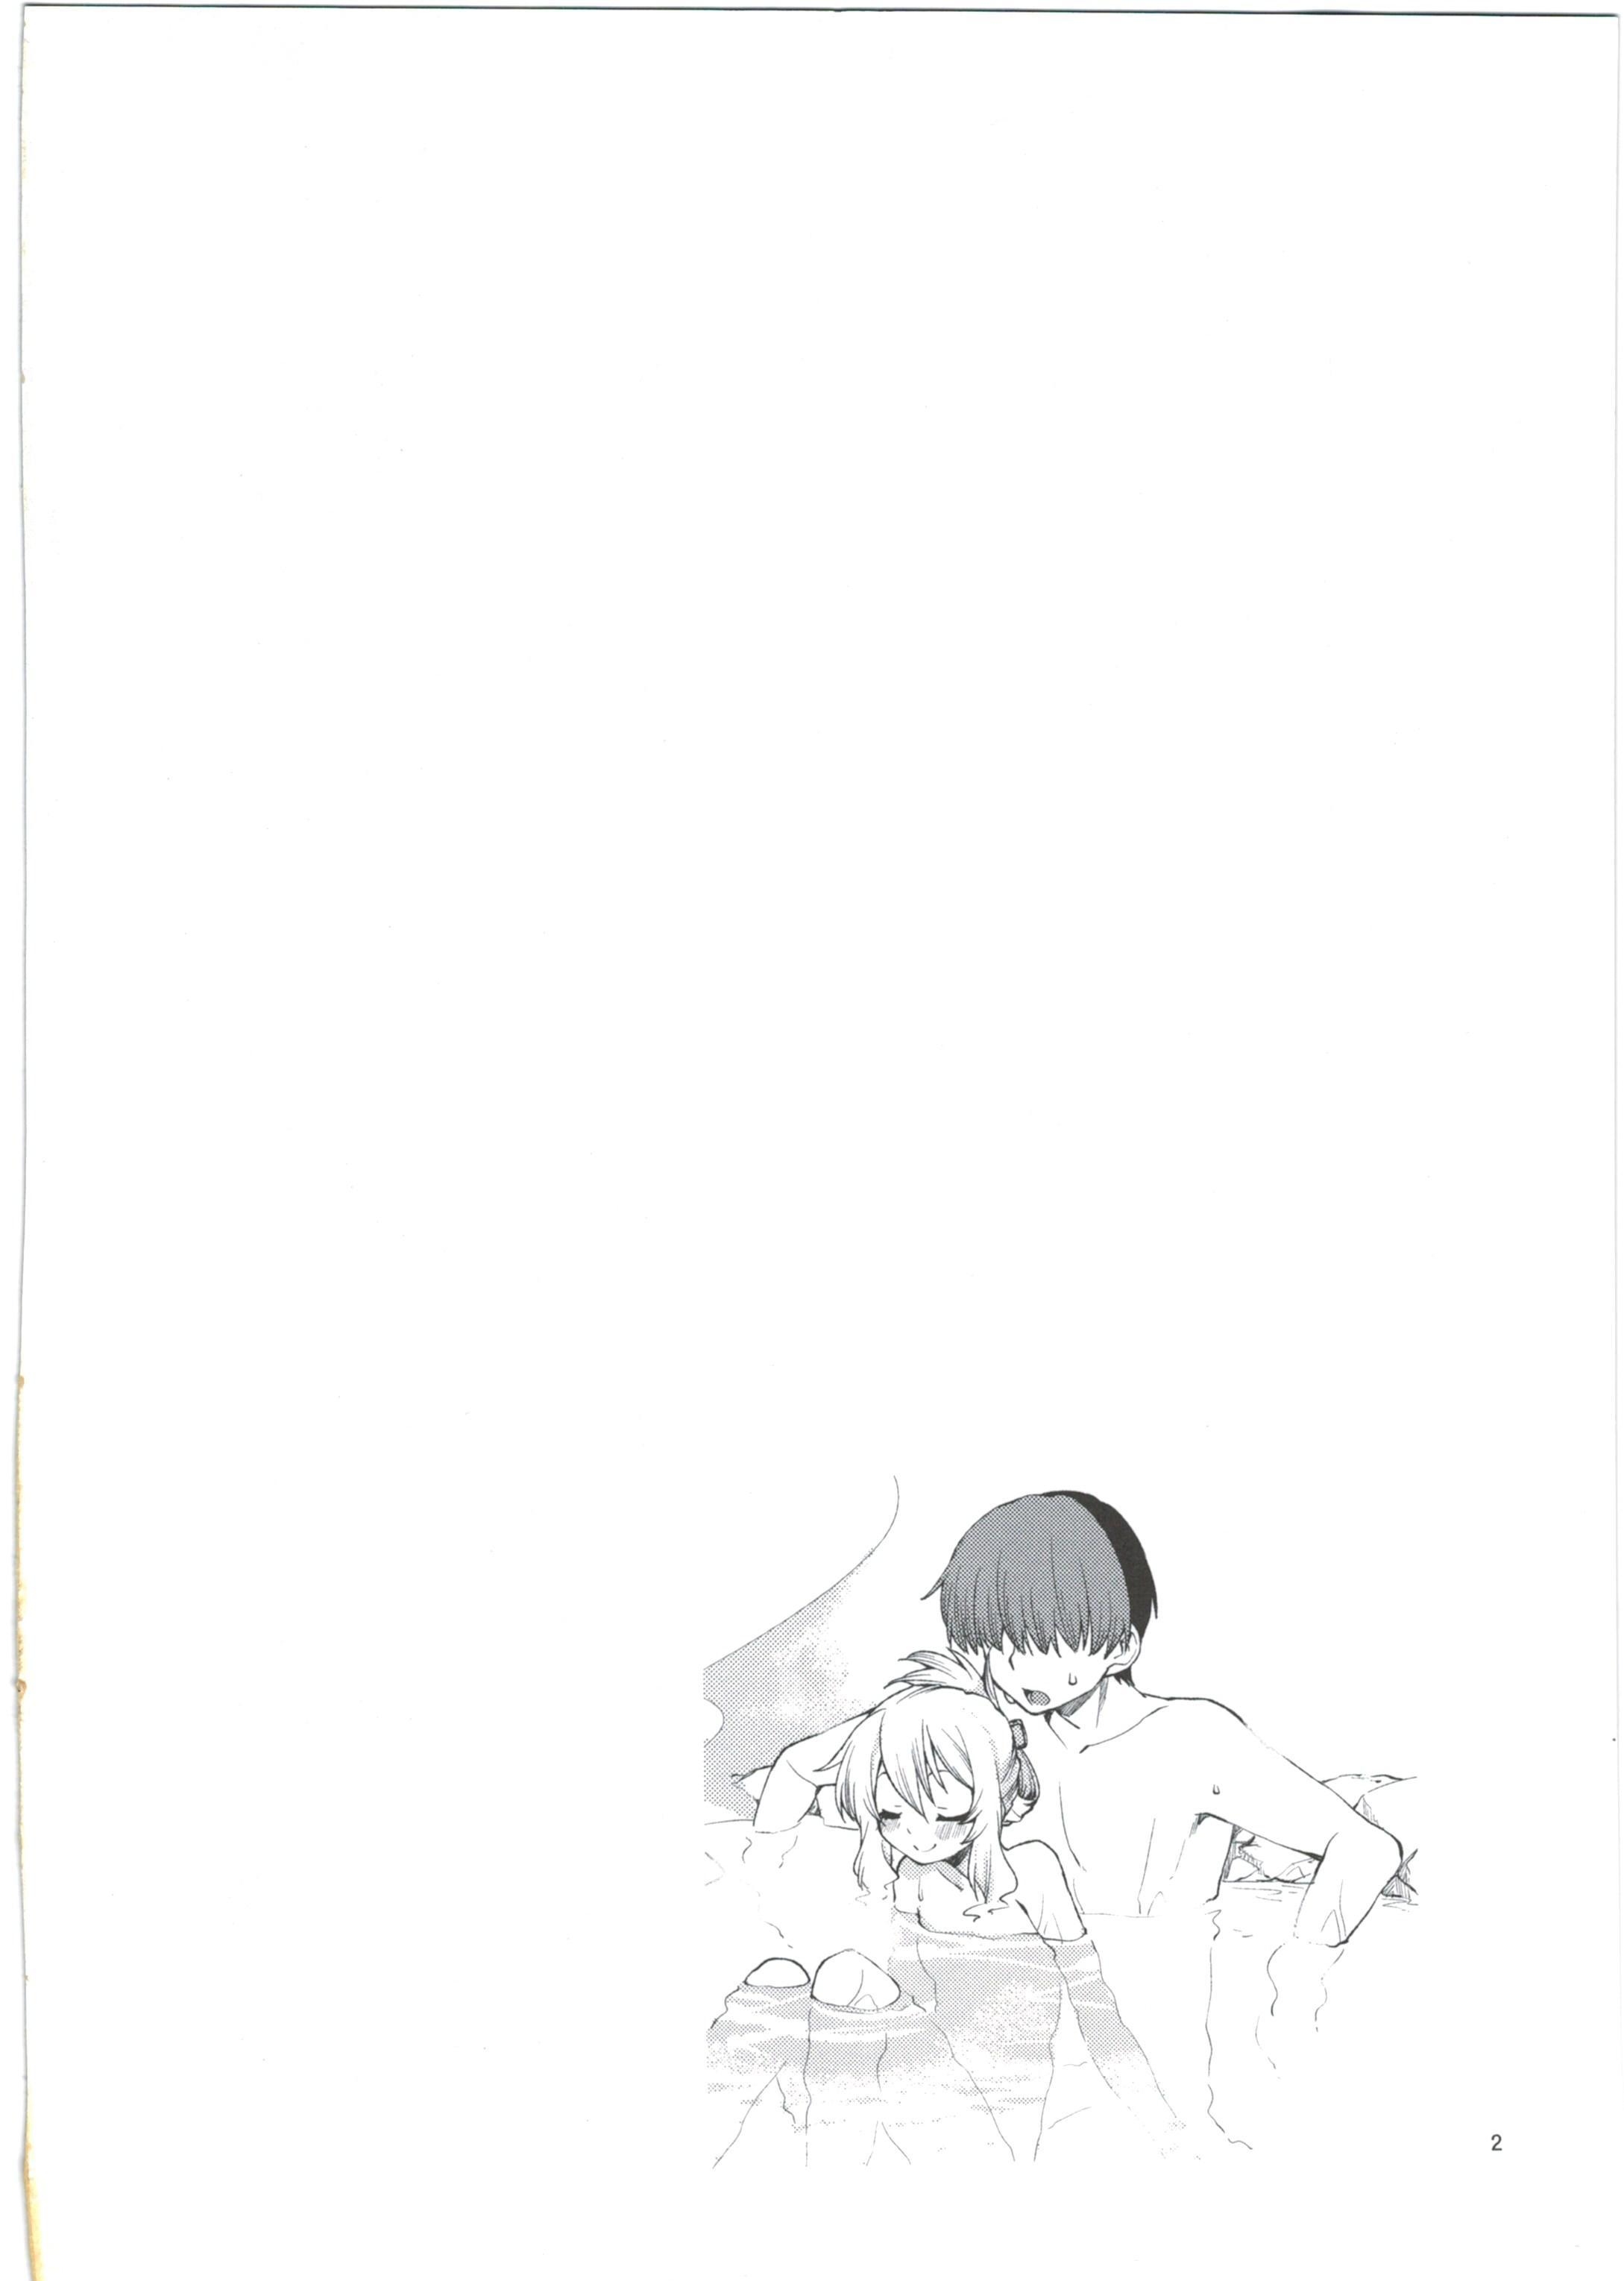 Momoka to Yukemuri Produce 3